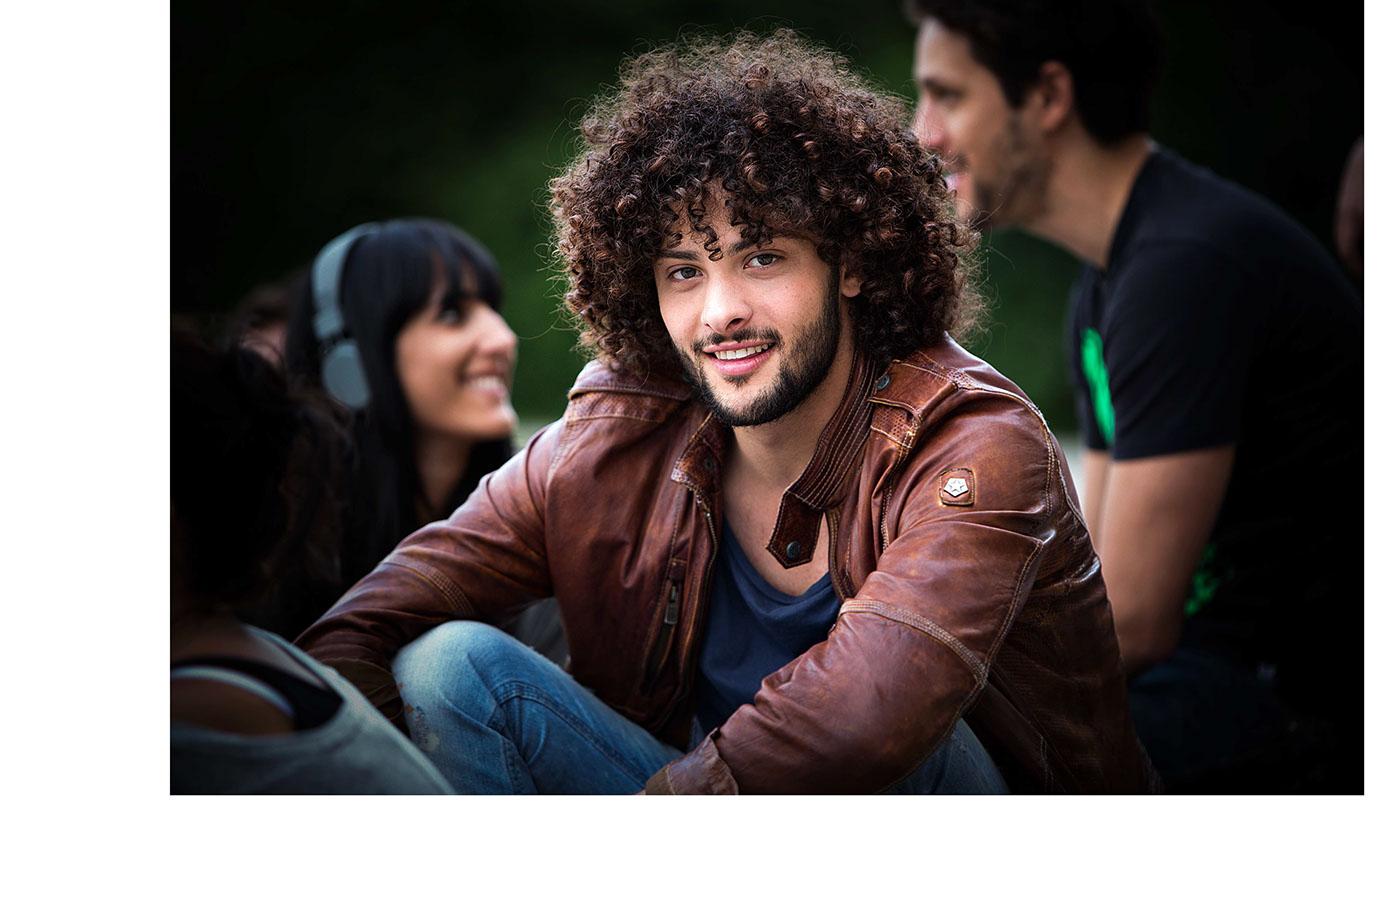 Munich dating app